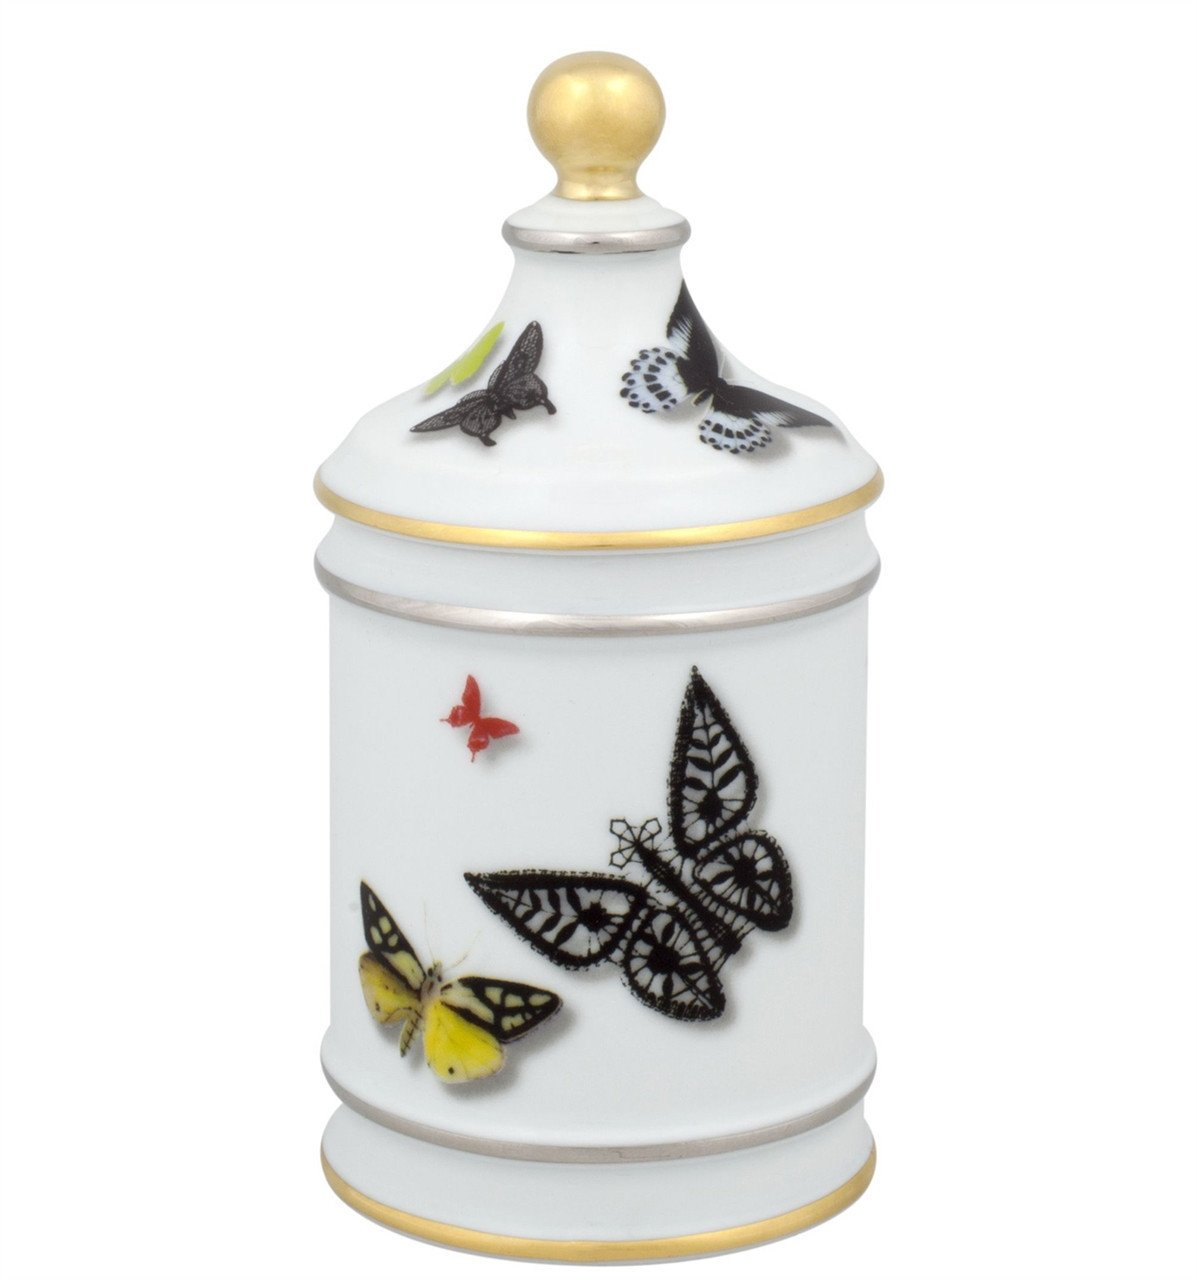 Vista Alegre Christian Lacroix Butterfly Parade Sugar Bowl by Christian Lacroix